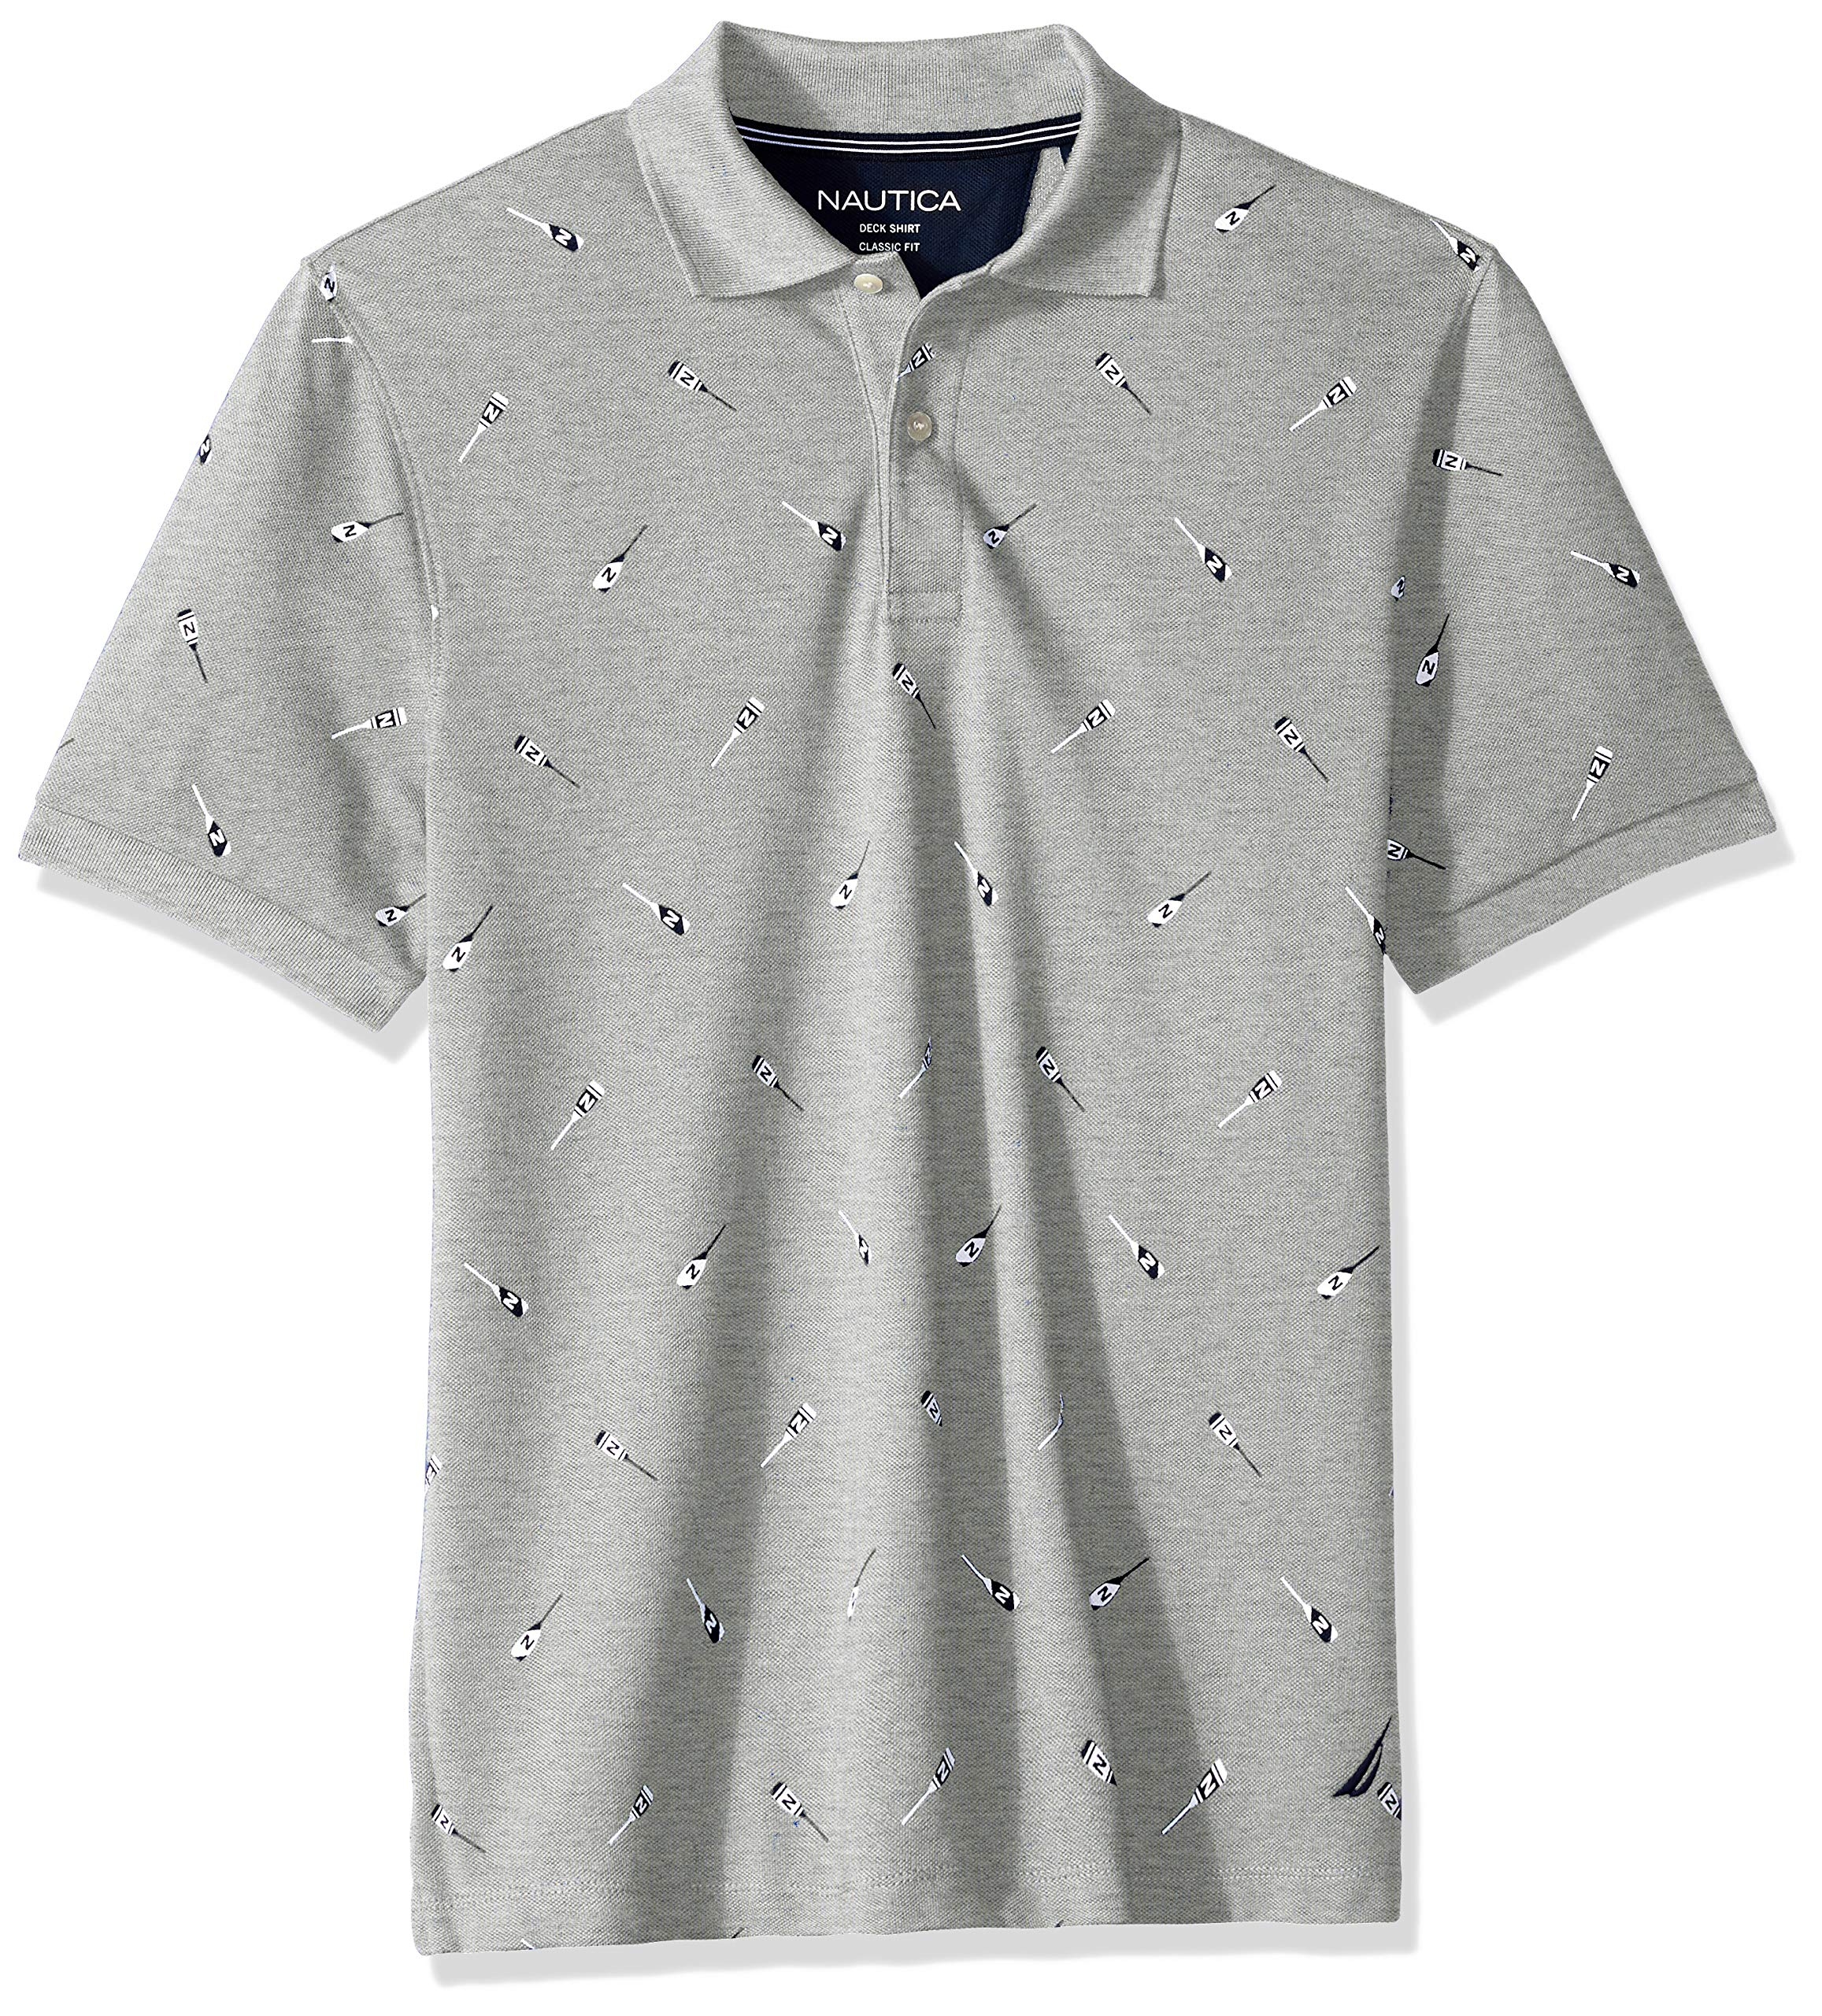 Nautica Men's Classic Short Sleeve Solid Polo Shirt, Grey Heather 003, Medium